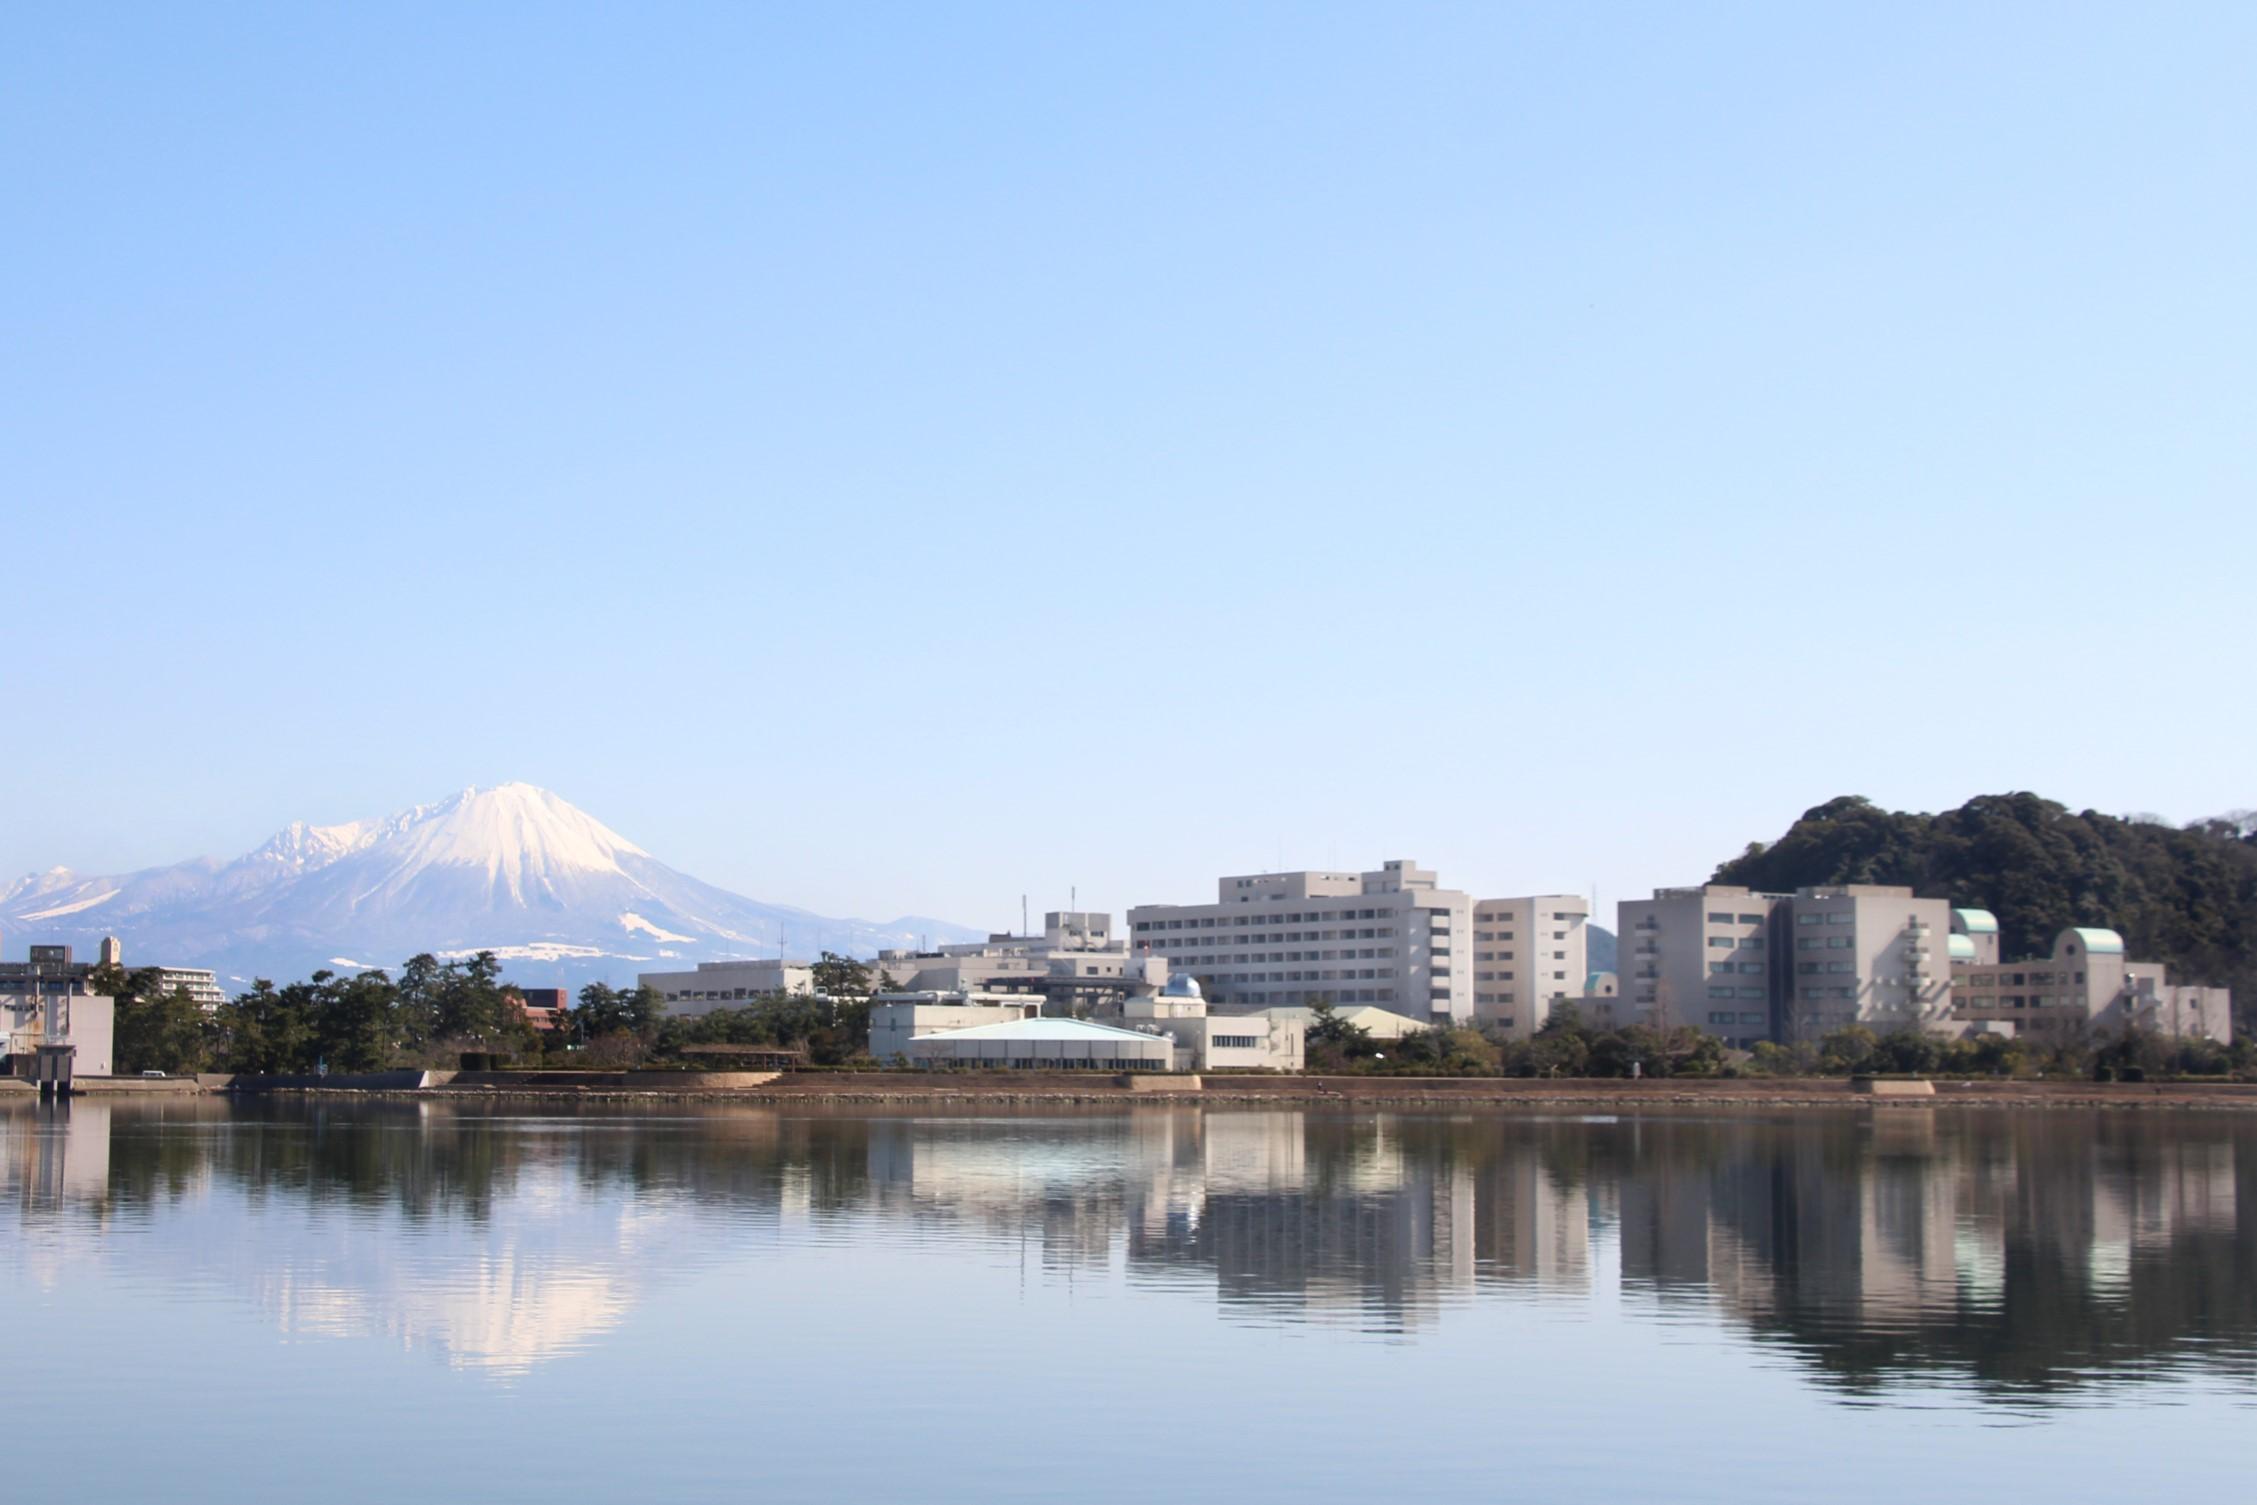 鳥取大学医学部全景(中海から)